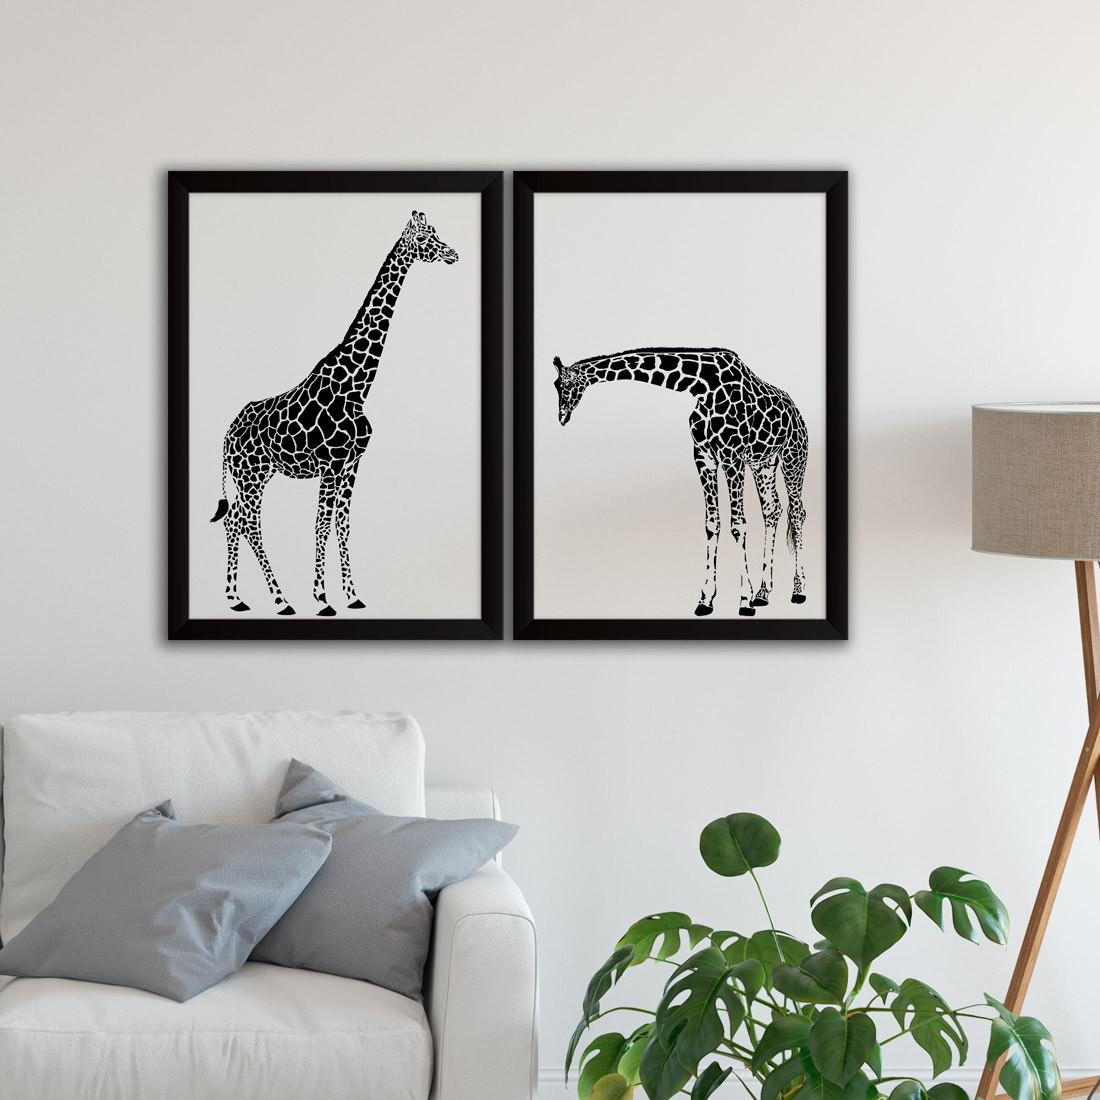 Conjunto de Quadros Decorativos Girafas